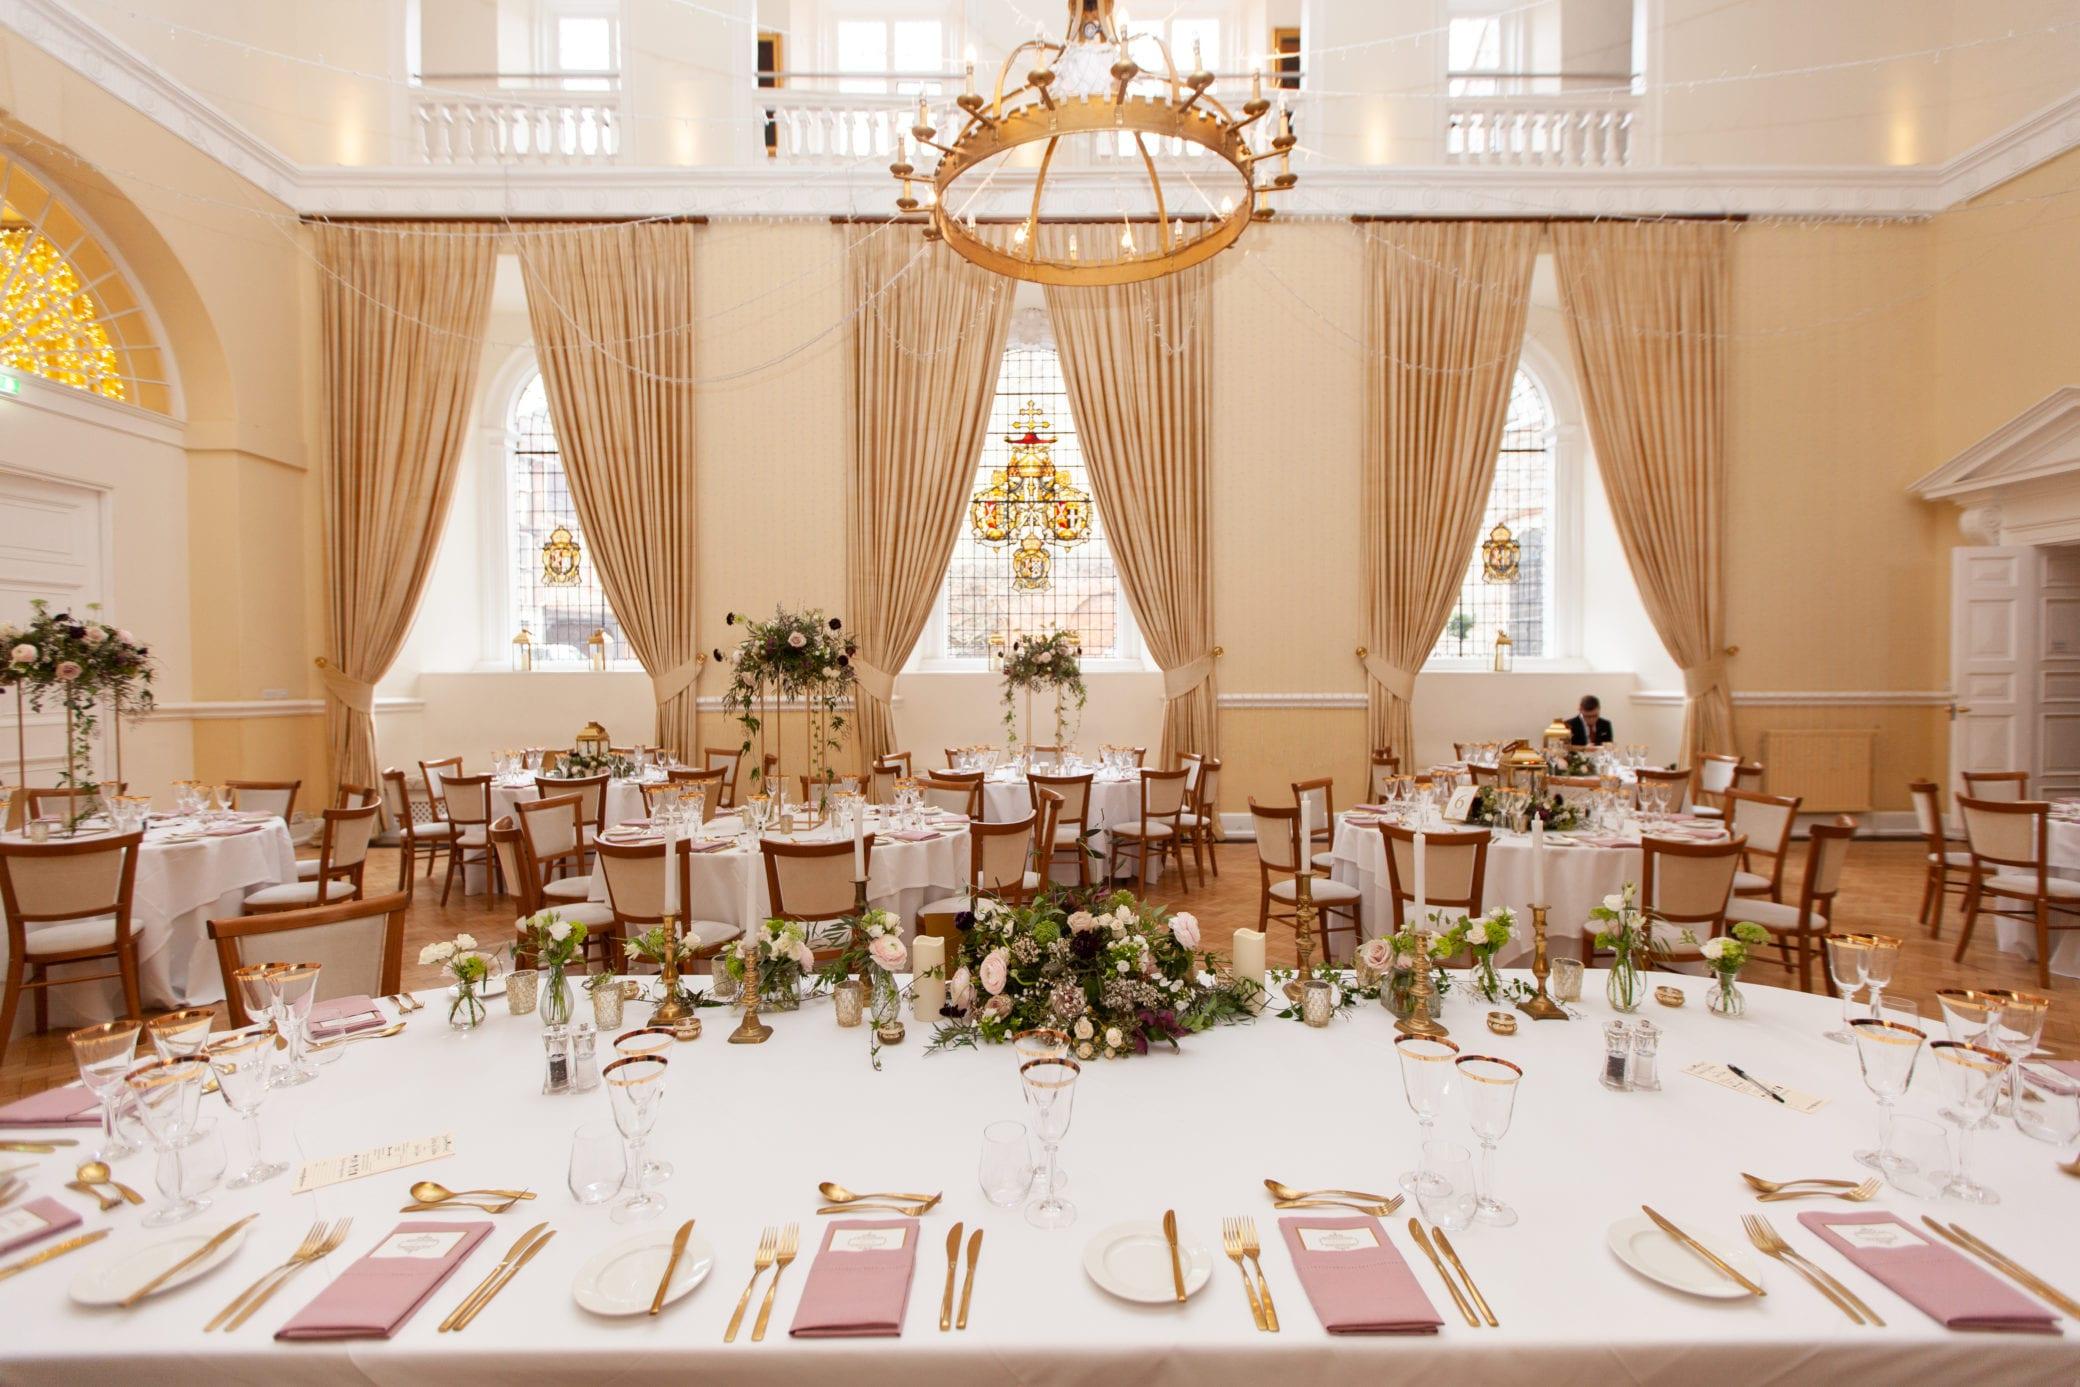 Stunning wedding reception venue in Surrey